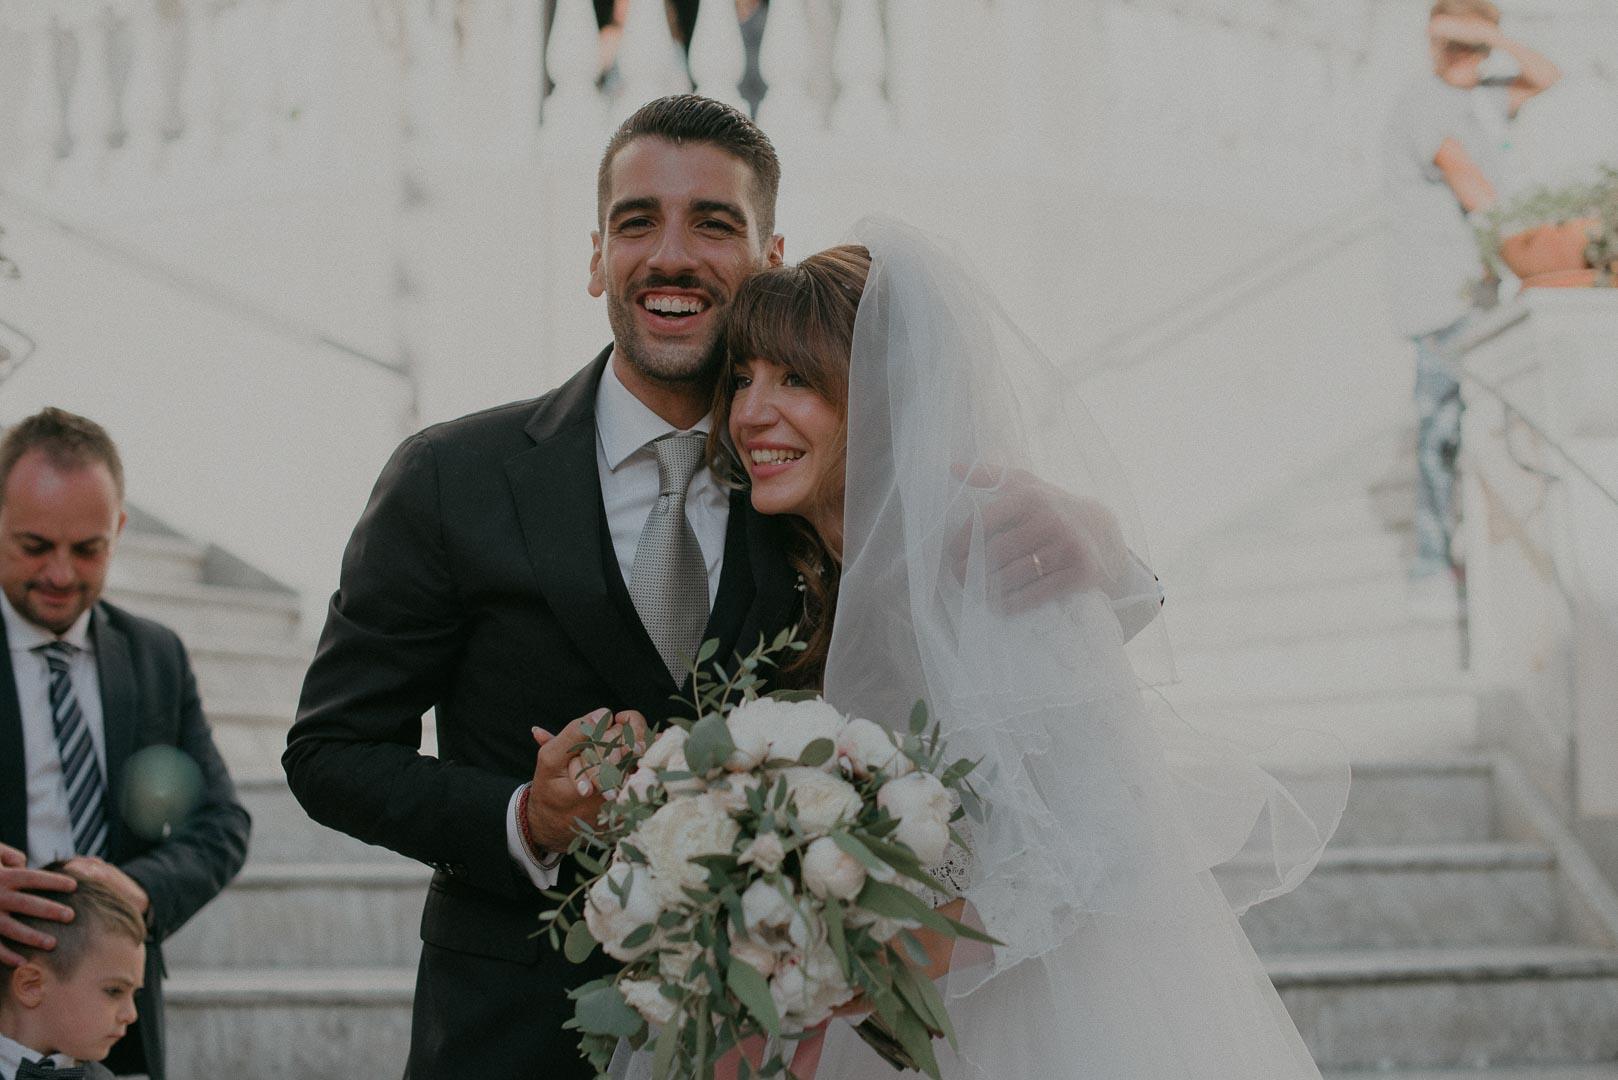 wedding-photographer-destination-fineart-bespoke-reportage-napoli-nabilah-vivianeizzo-spazio46-80